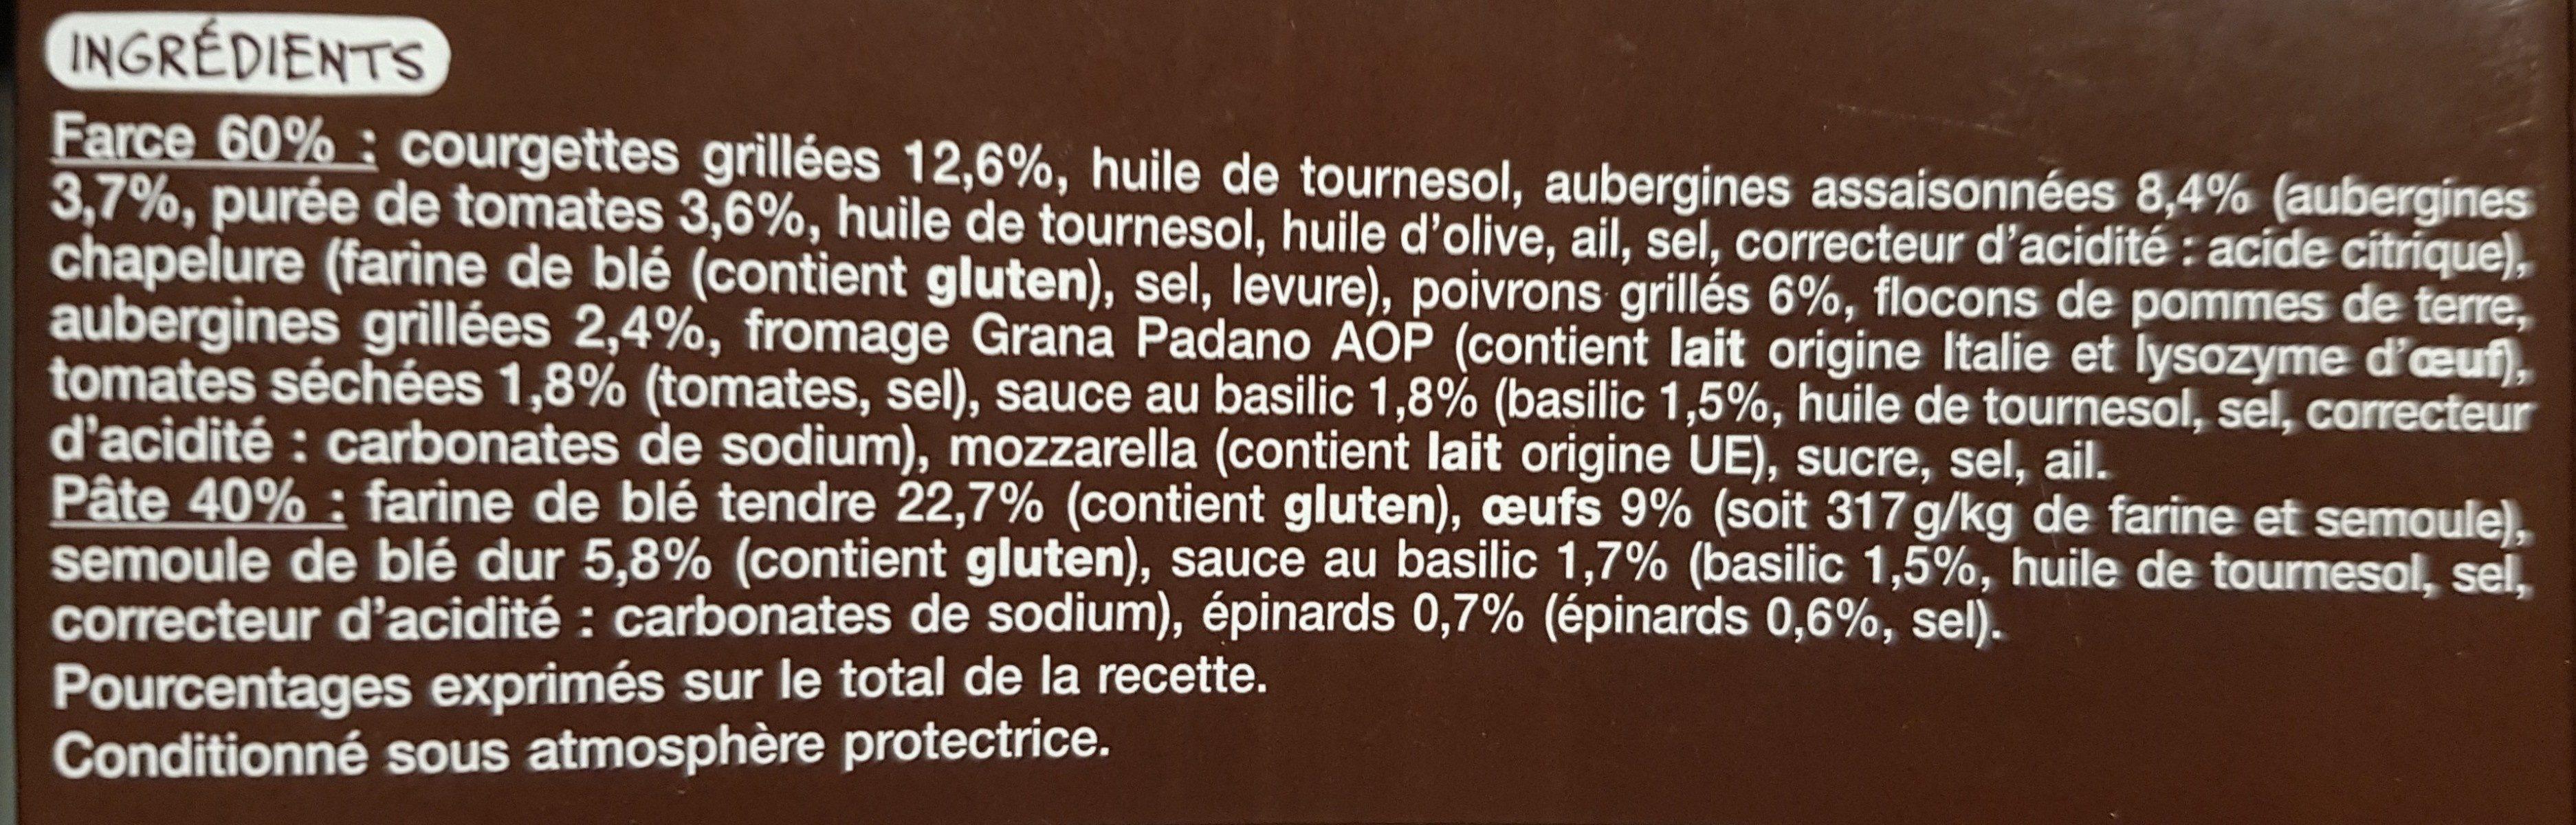 Girasoli Légumes grillés - Ingrédients - fr